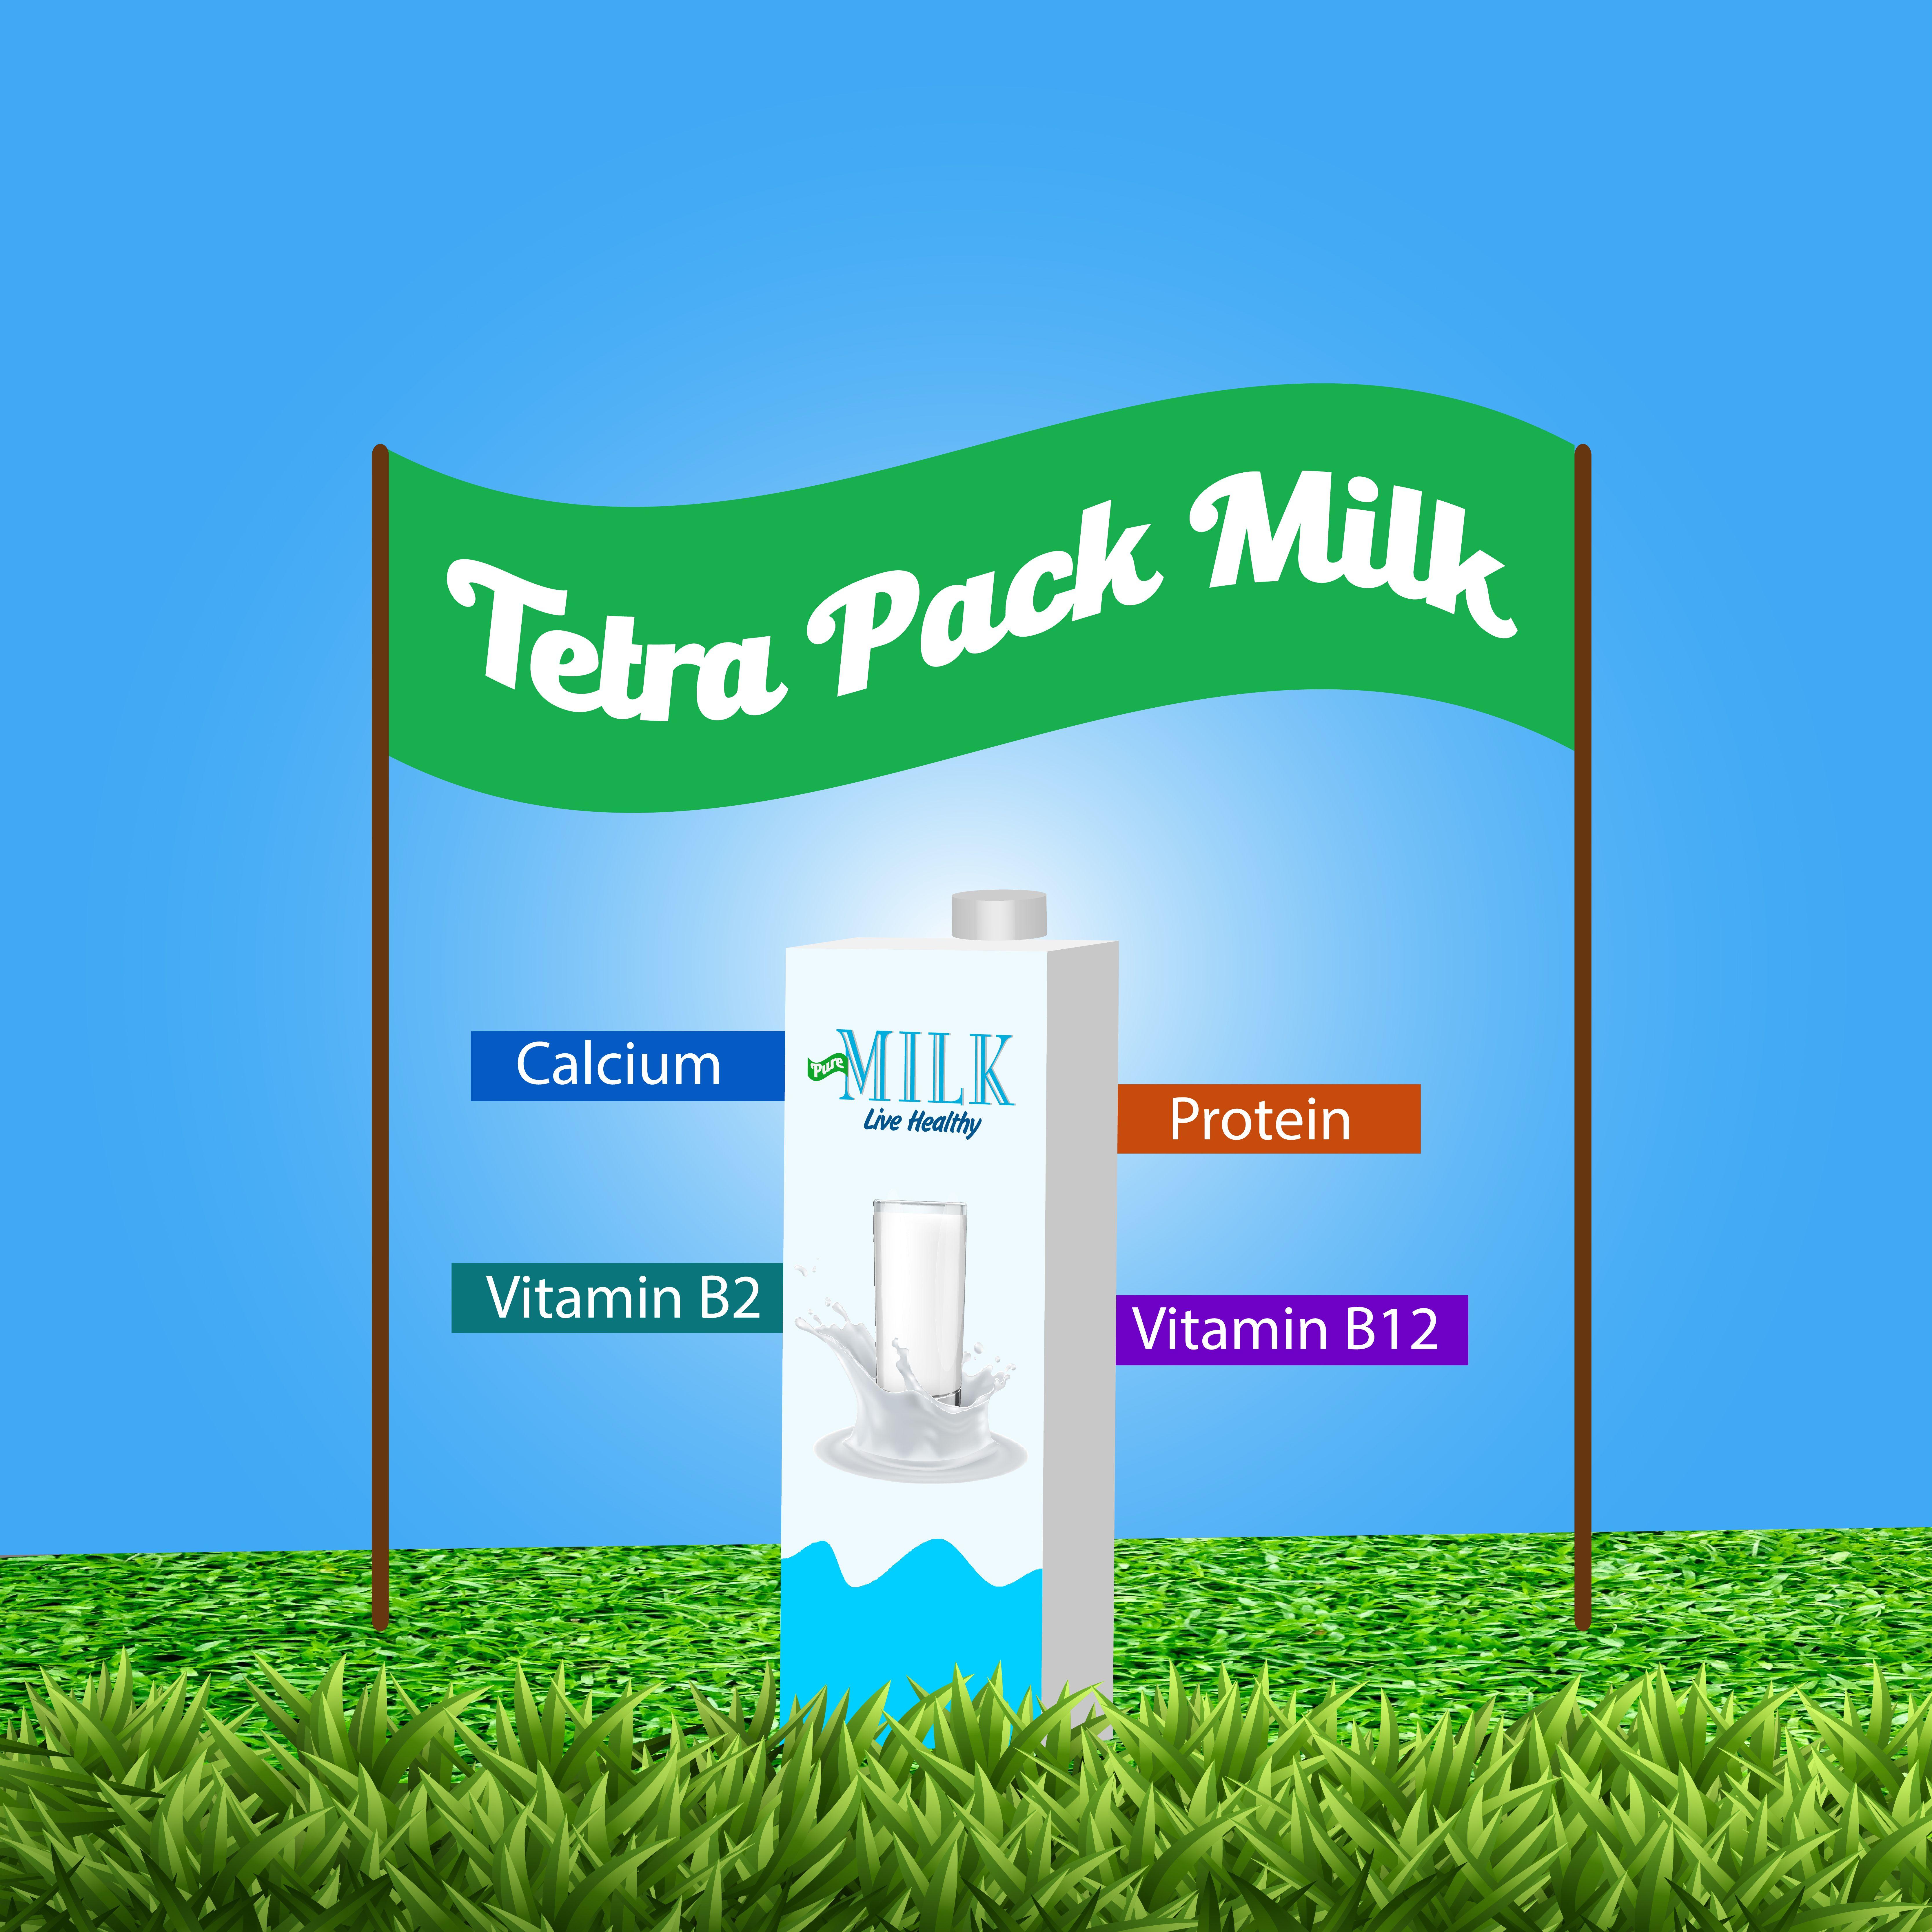 3d Tetra Pack presenting Milk Brand Milk brands, Tetra, Milk